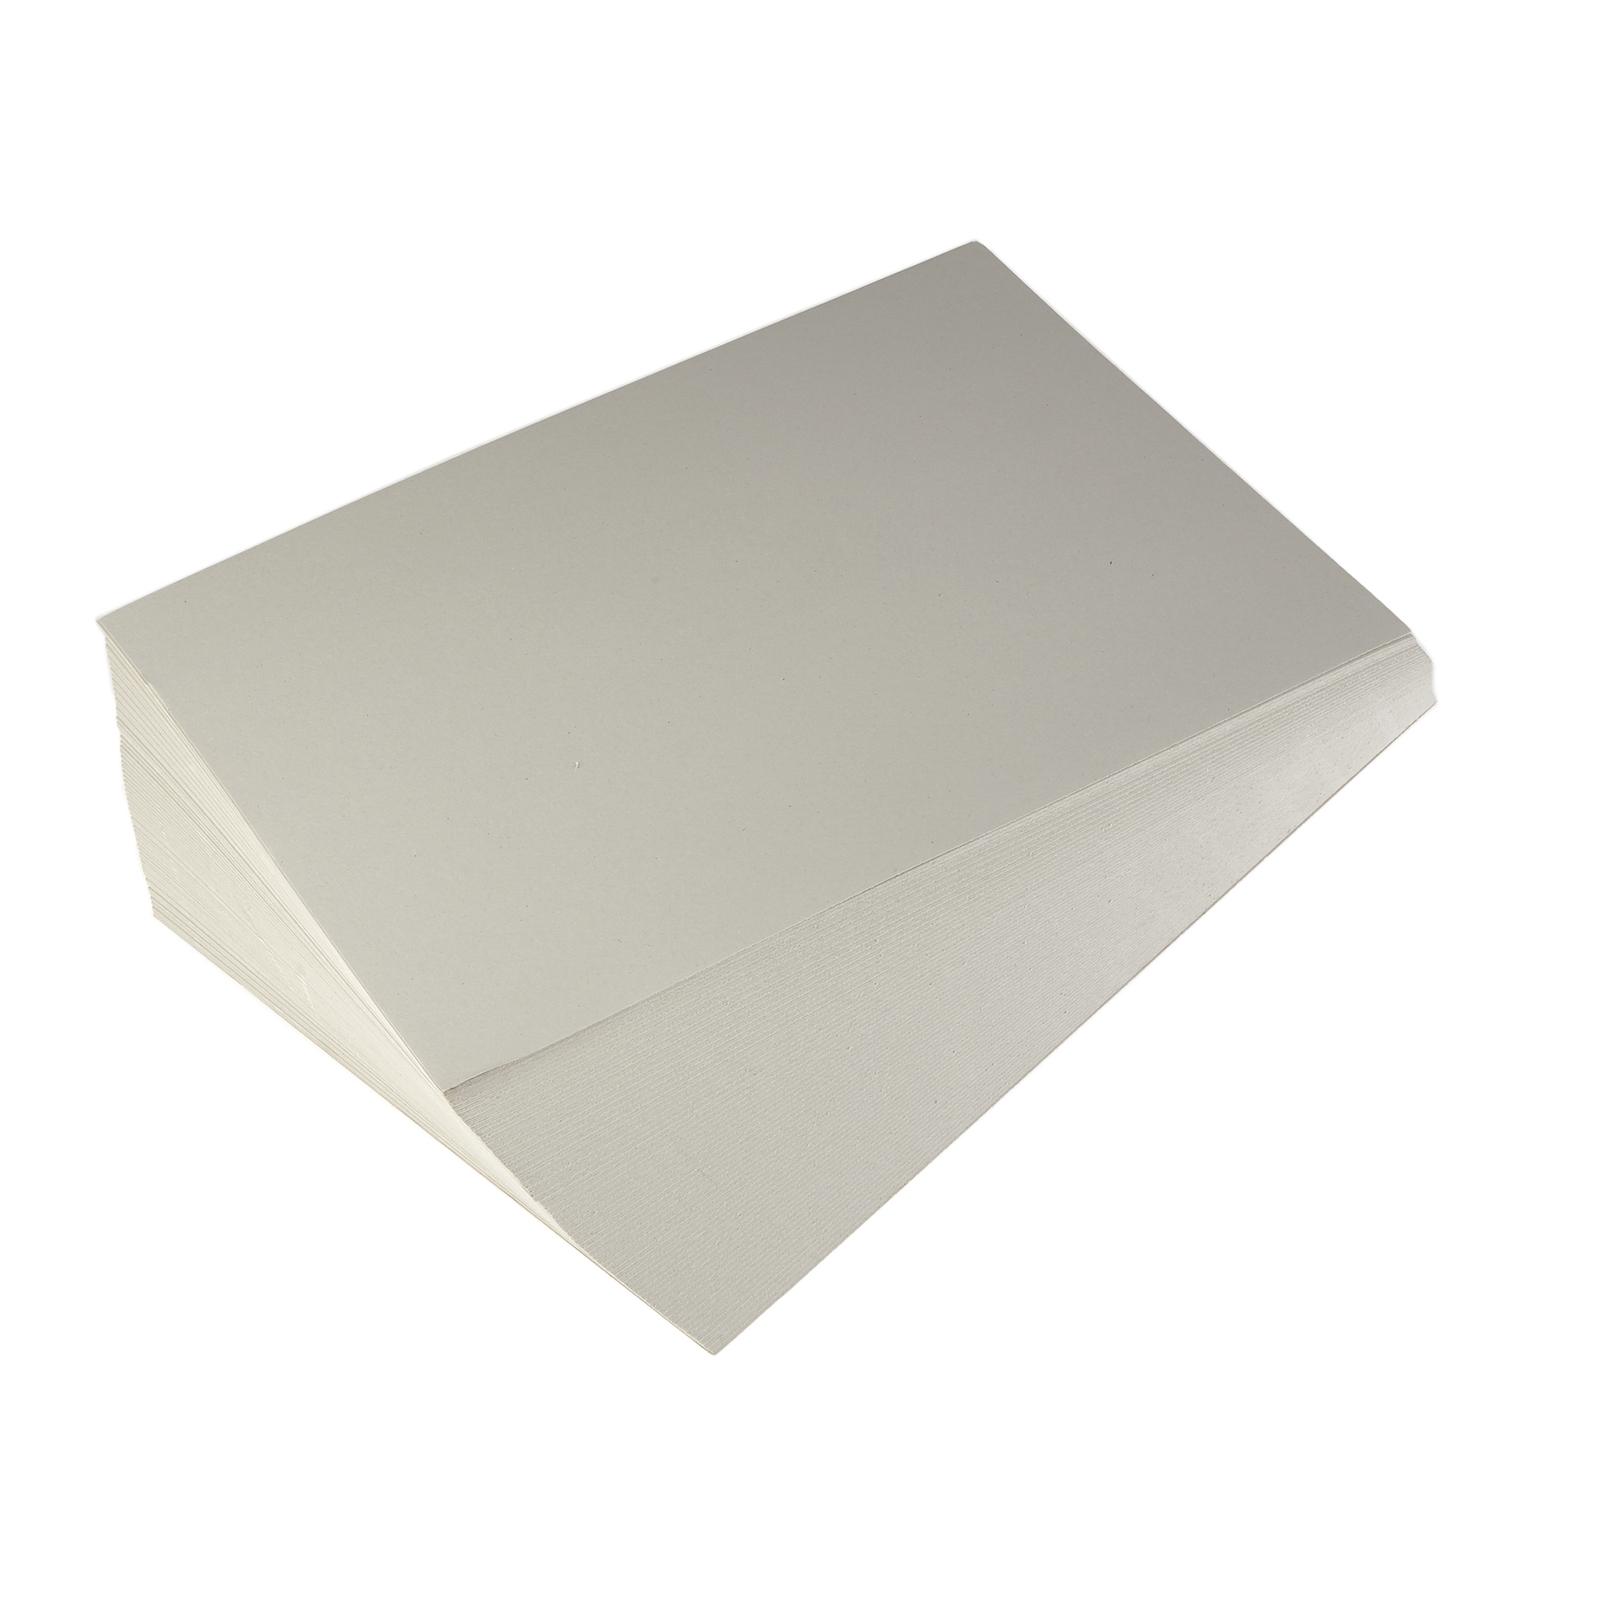 Off White Sugar Paper 180gsm A1 Pack 100